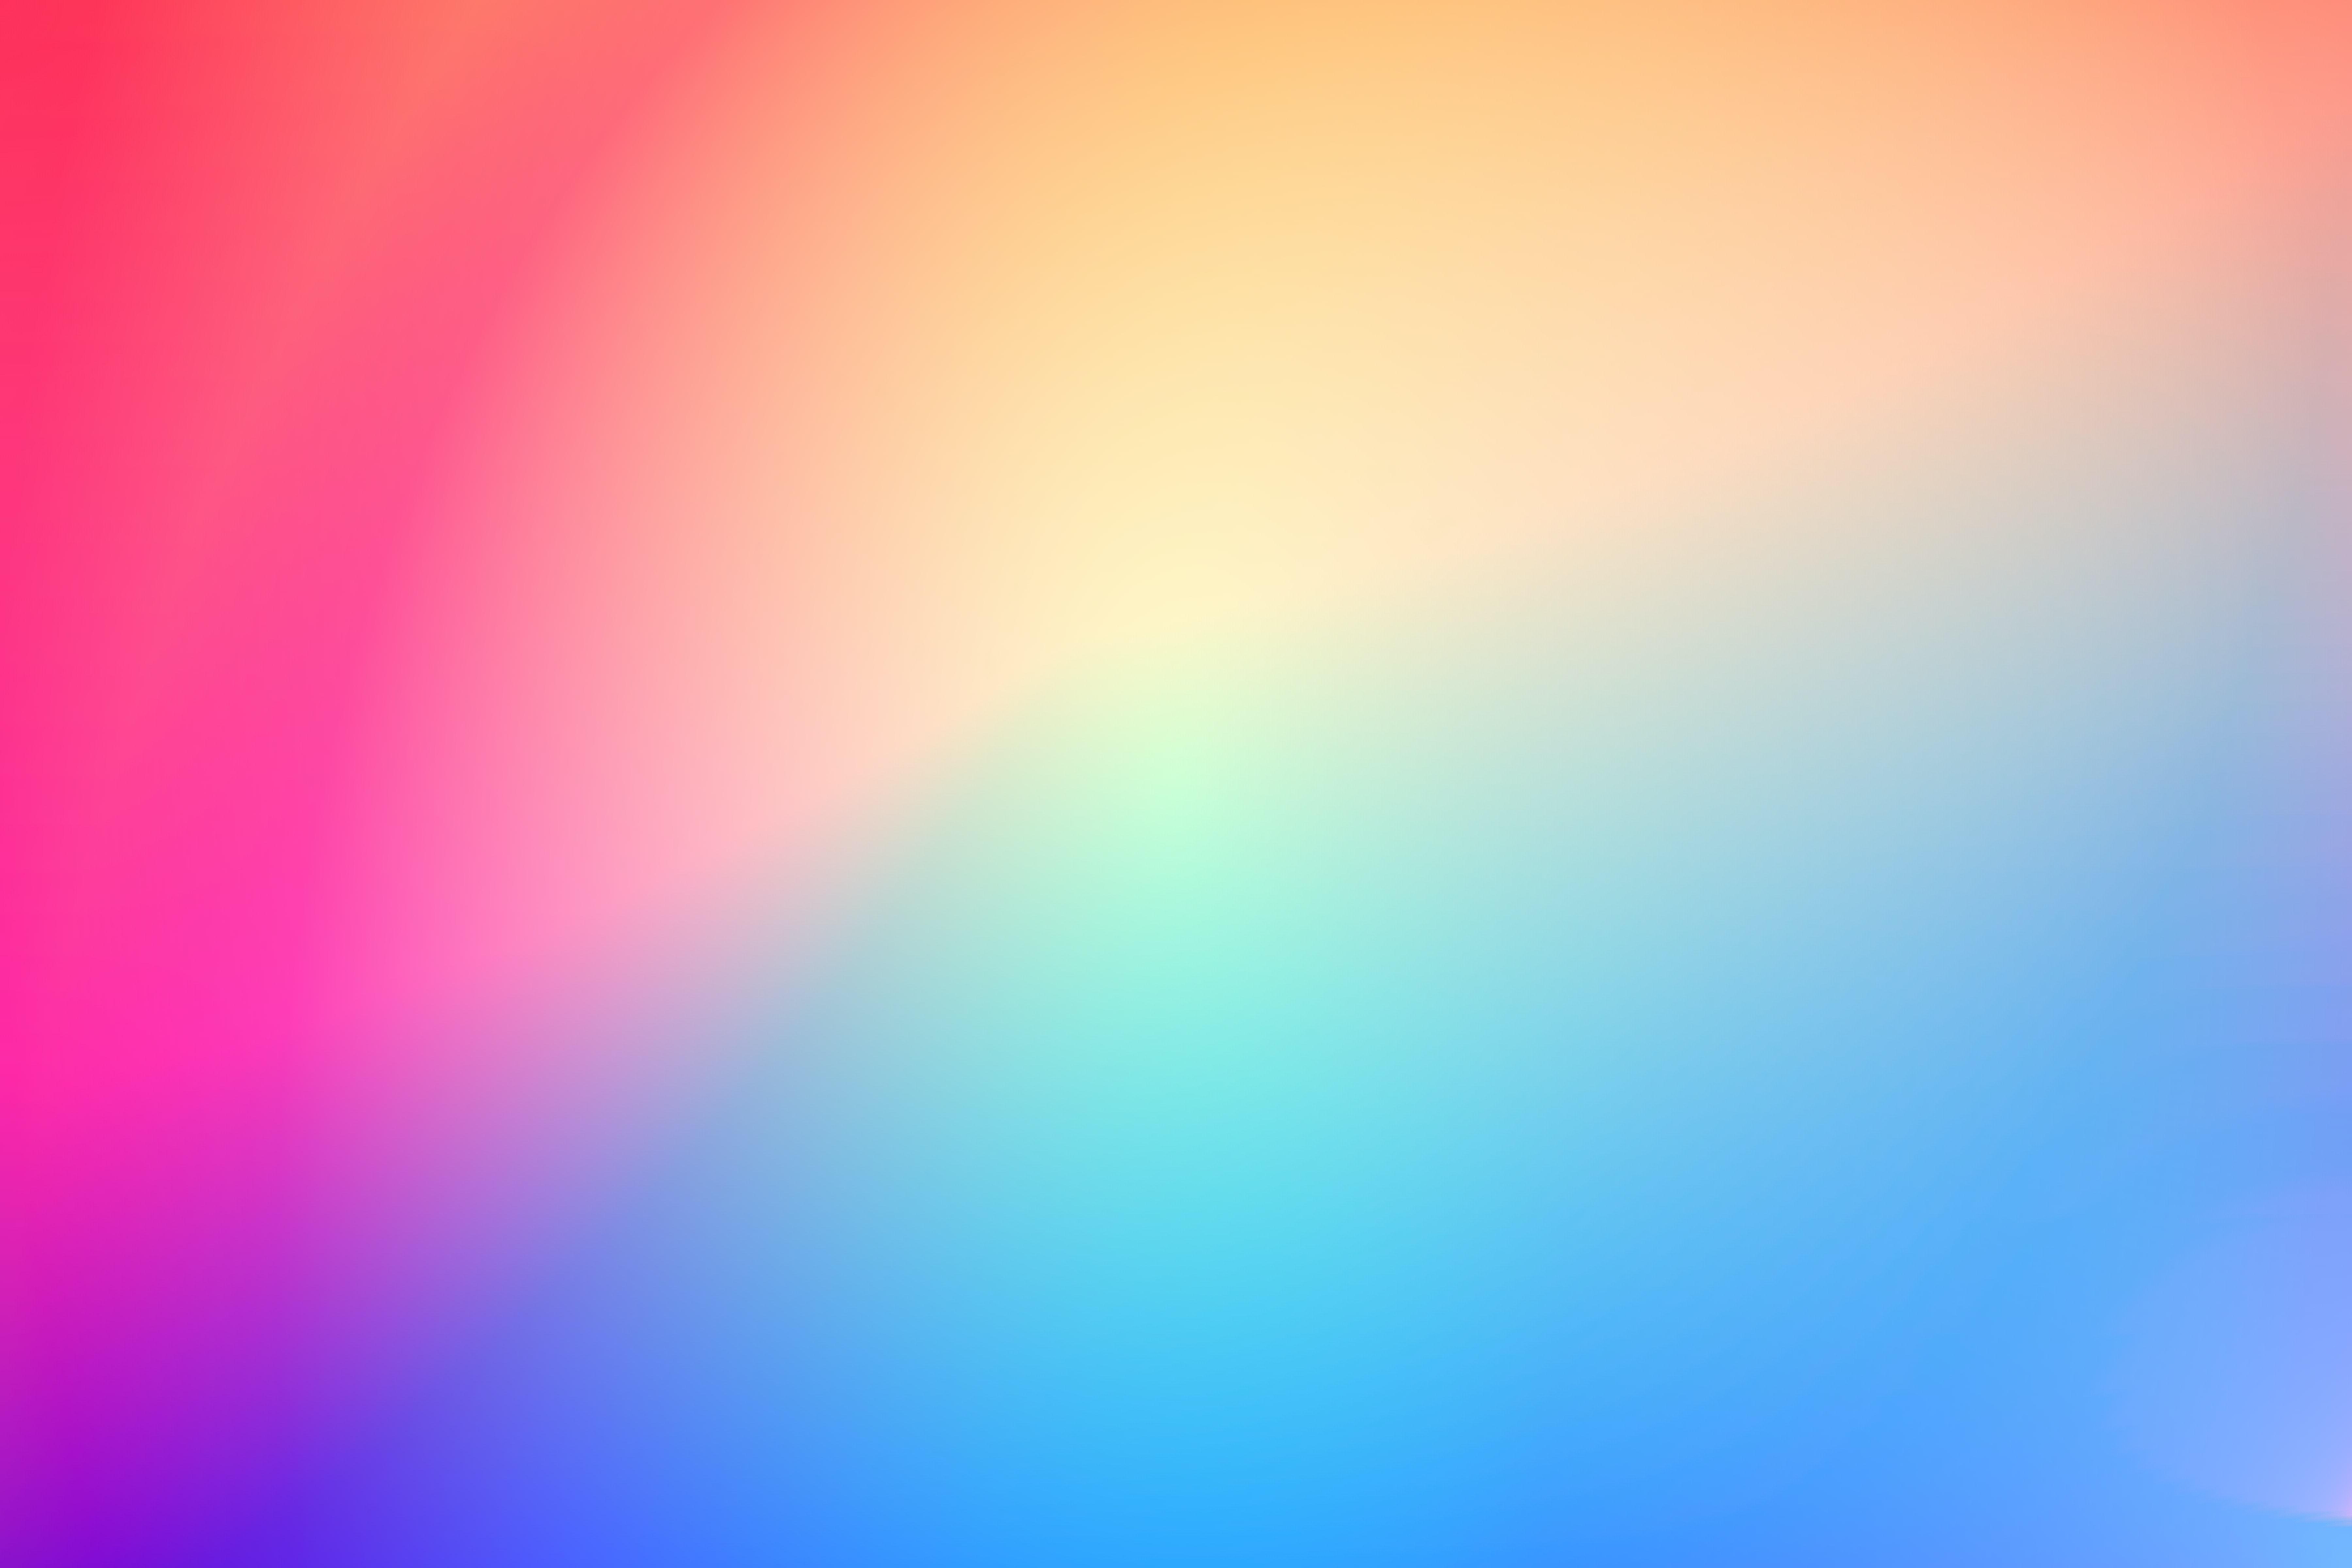 900 Gradient Background Images Download Hd Backgrounds On Unsplash